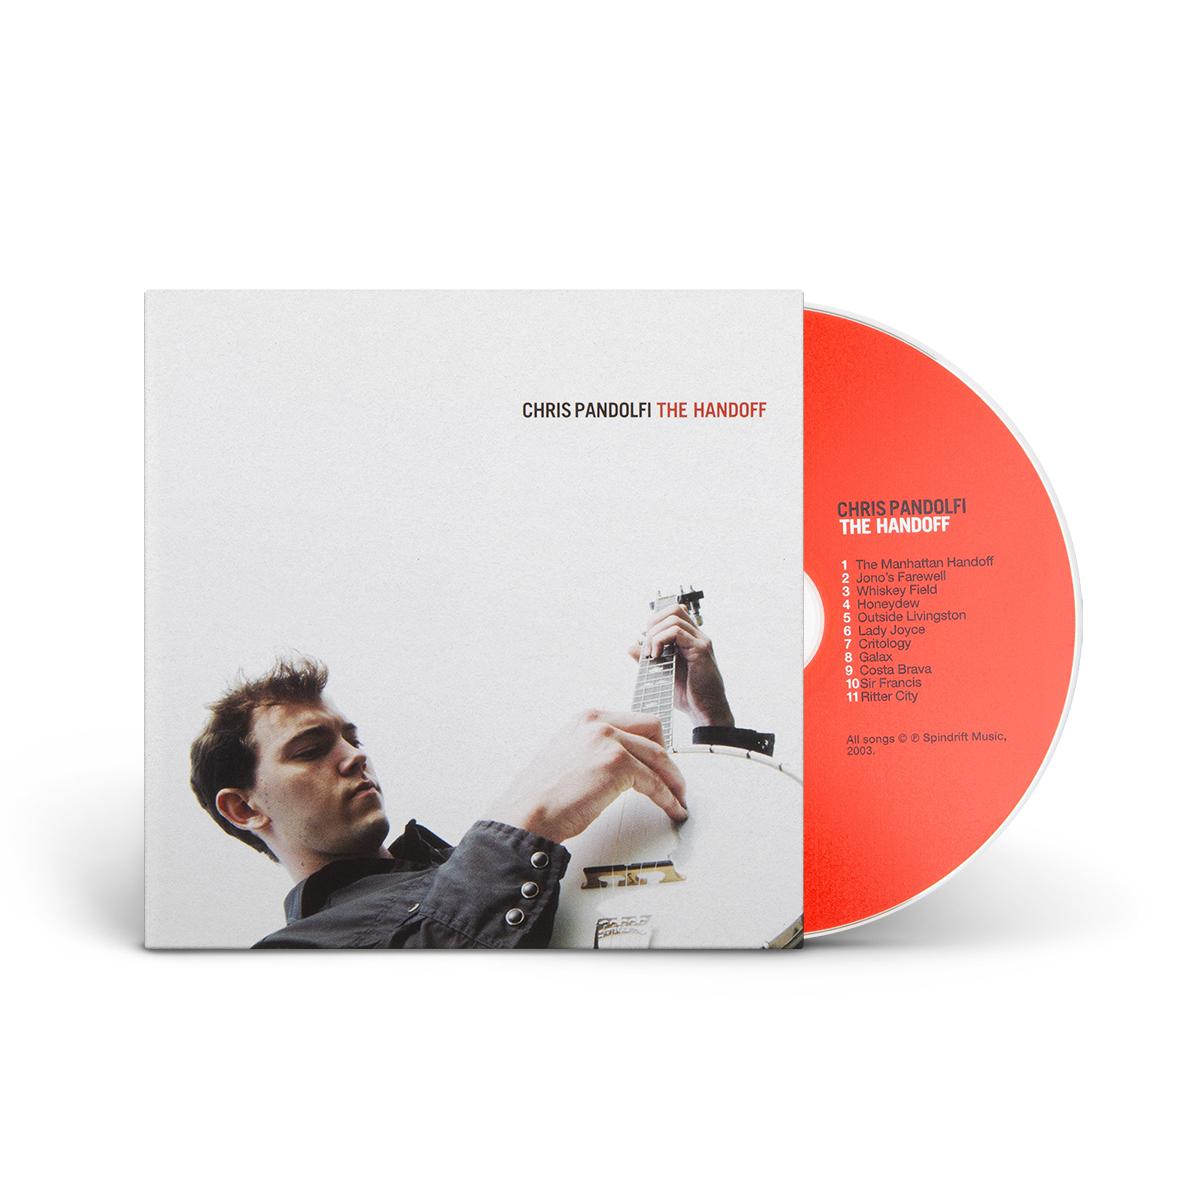 Chris Pandolfi – The Handoff CD